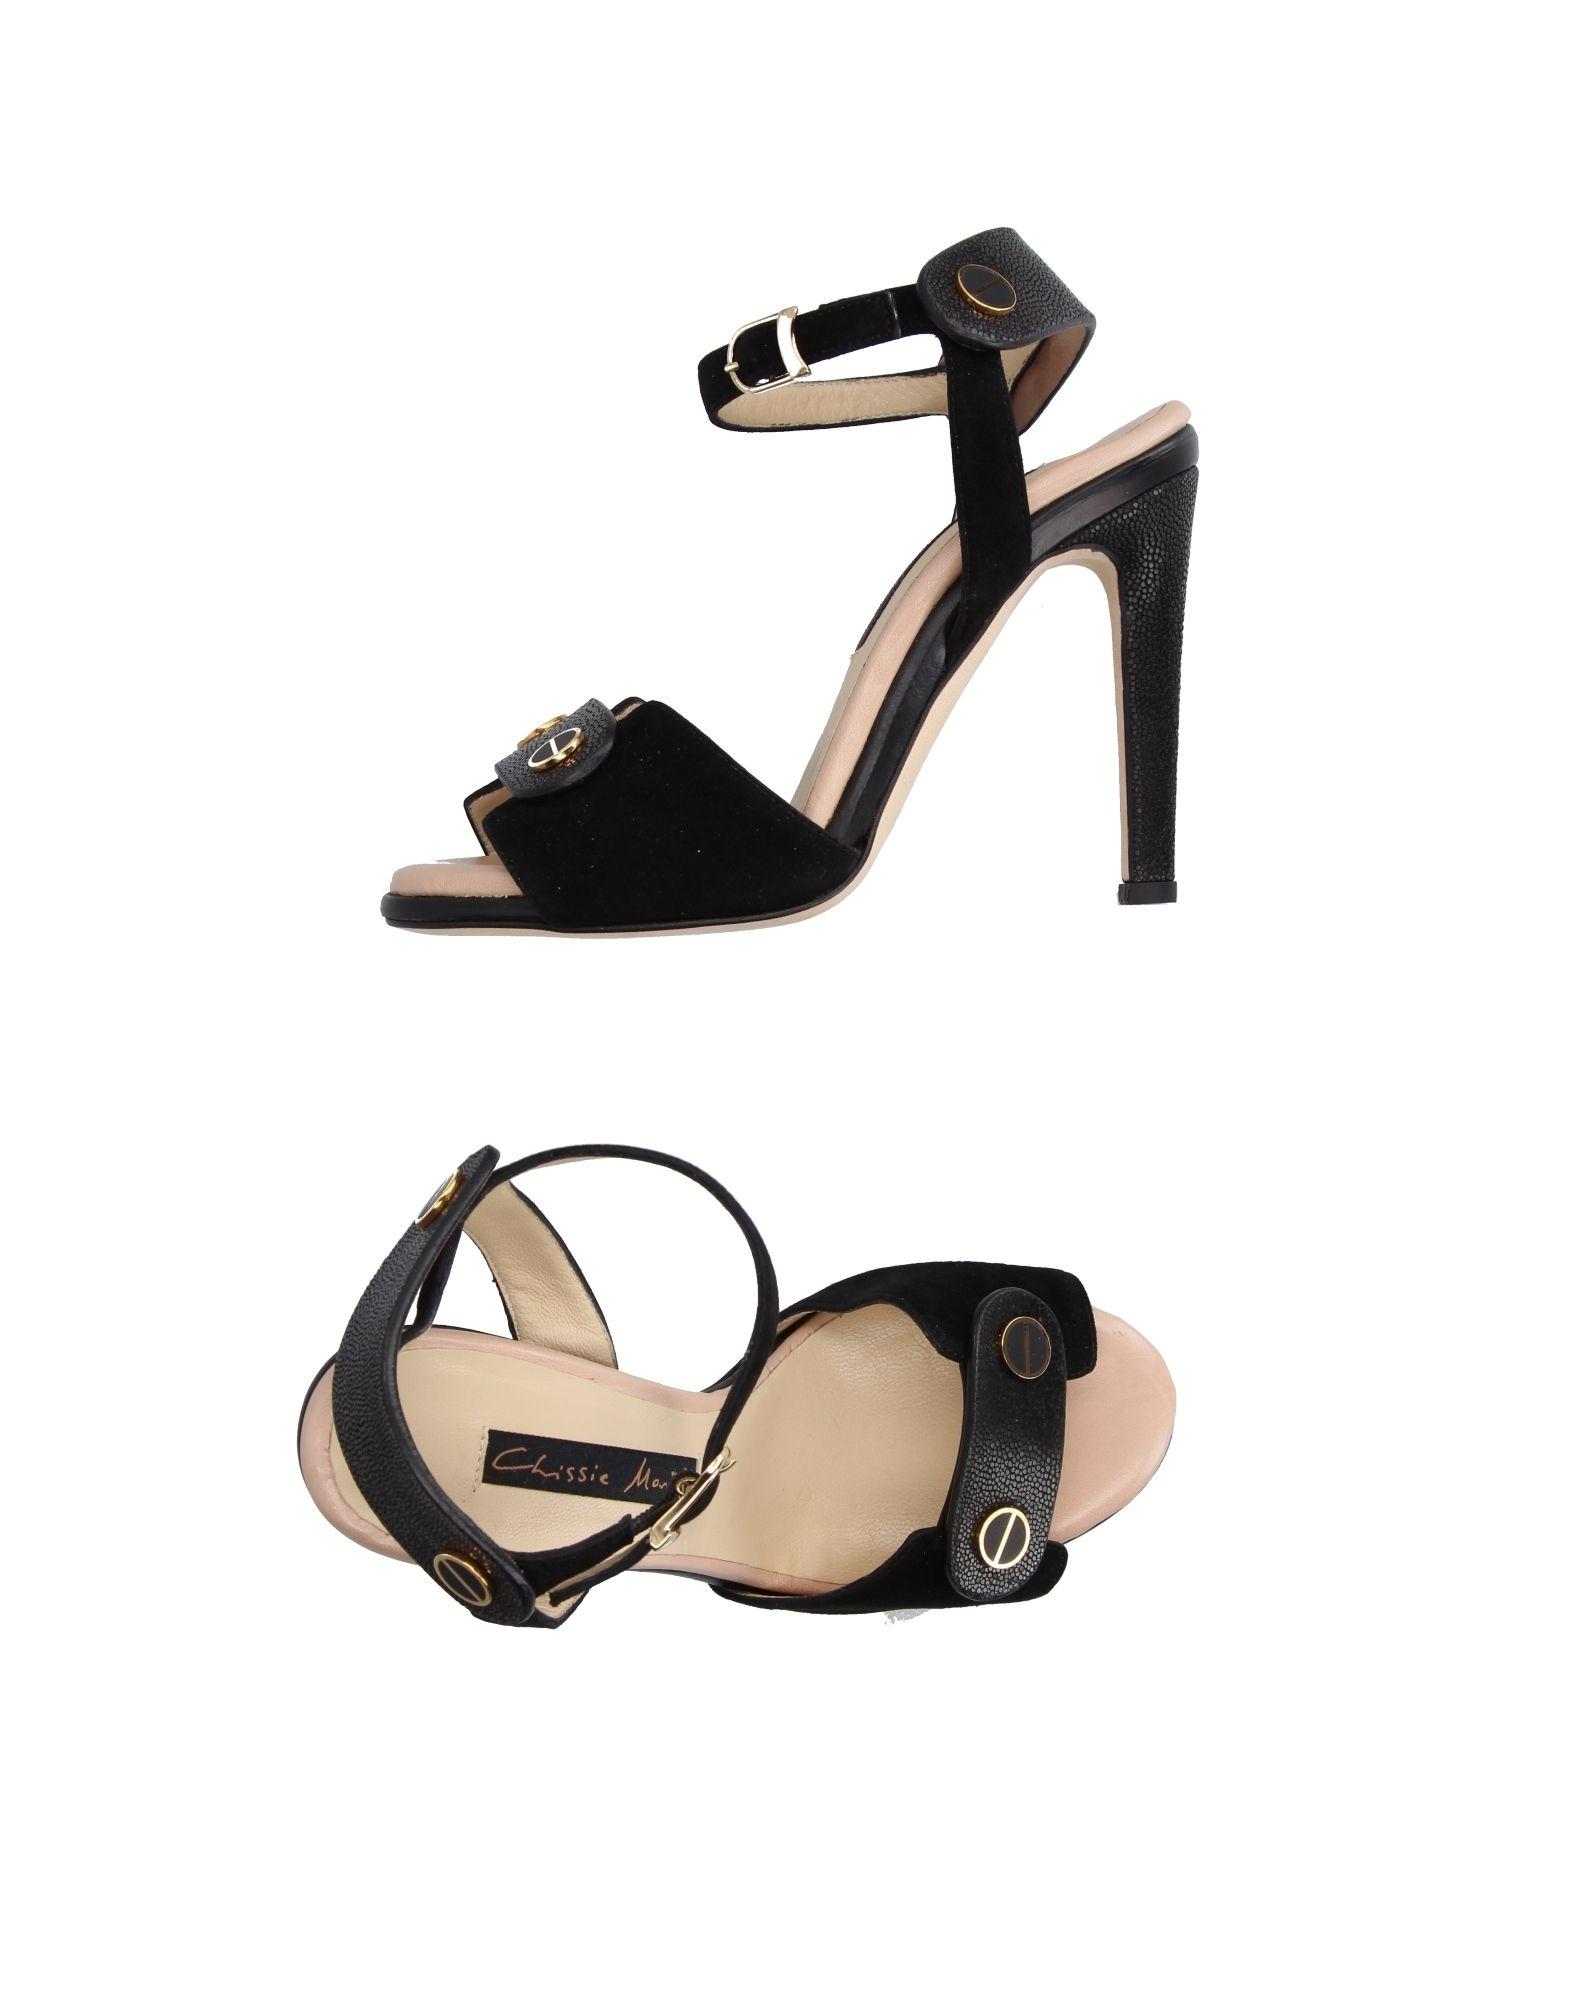 Sandals in Black